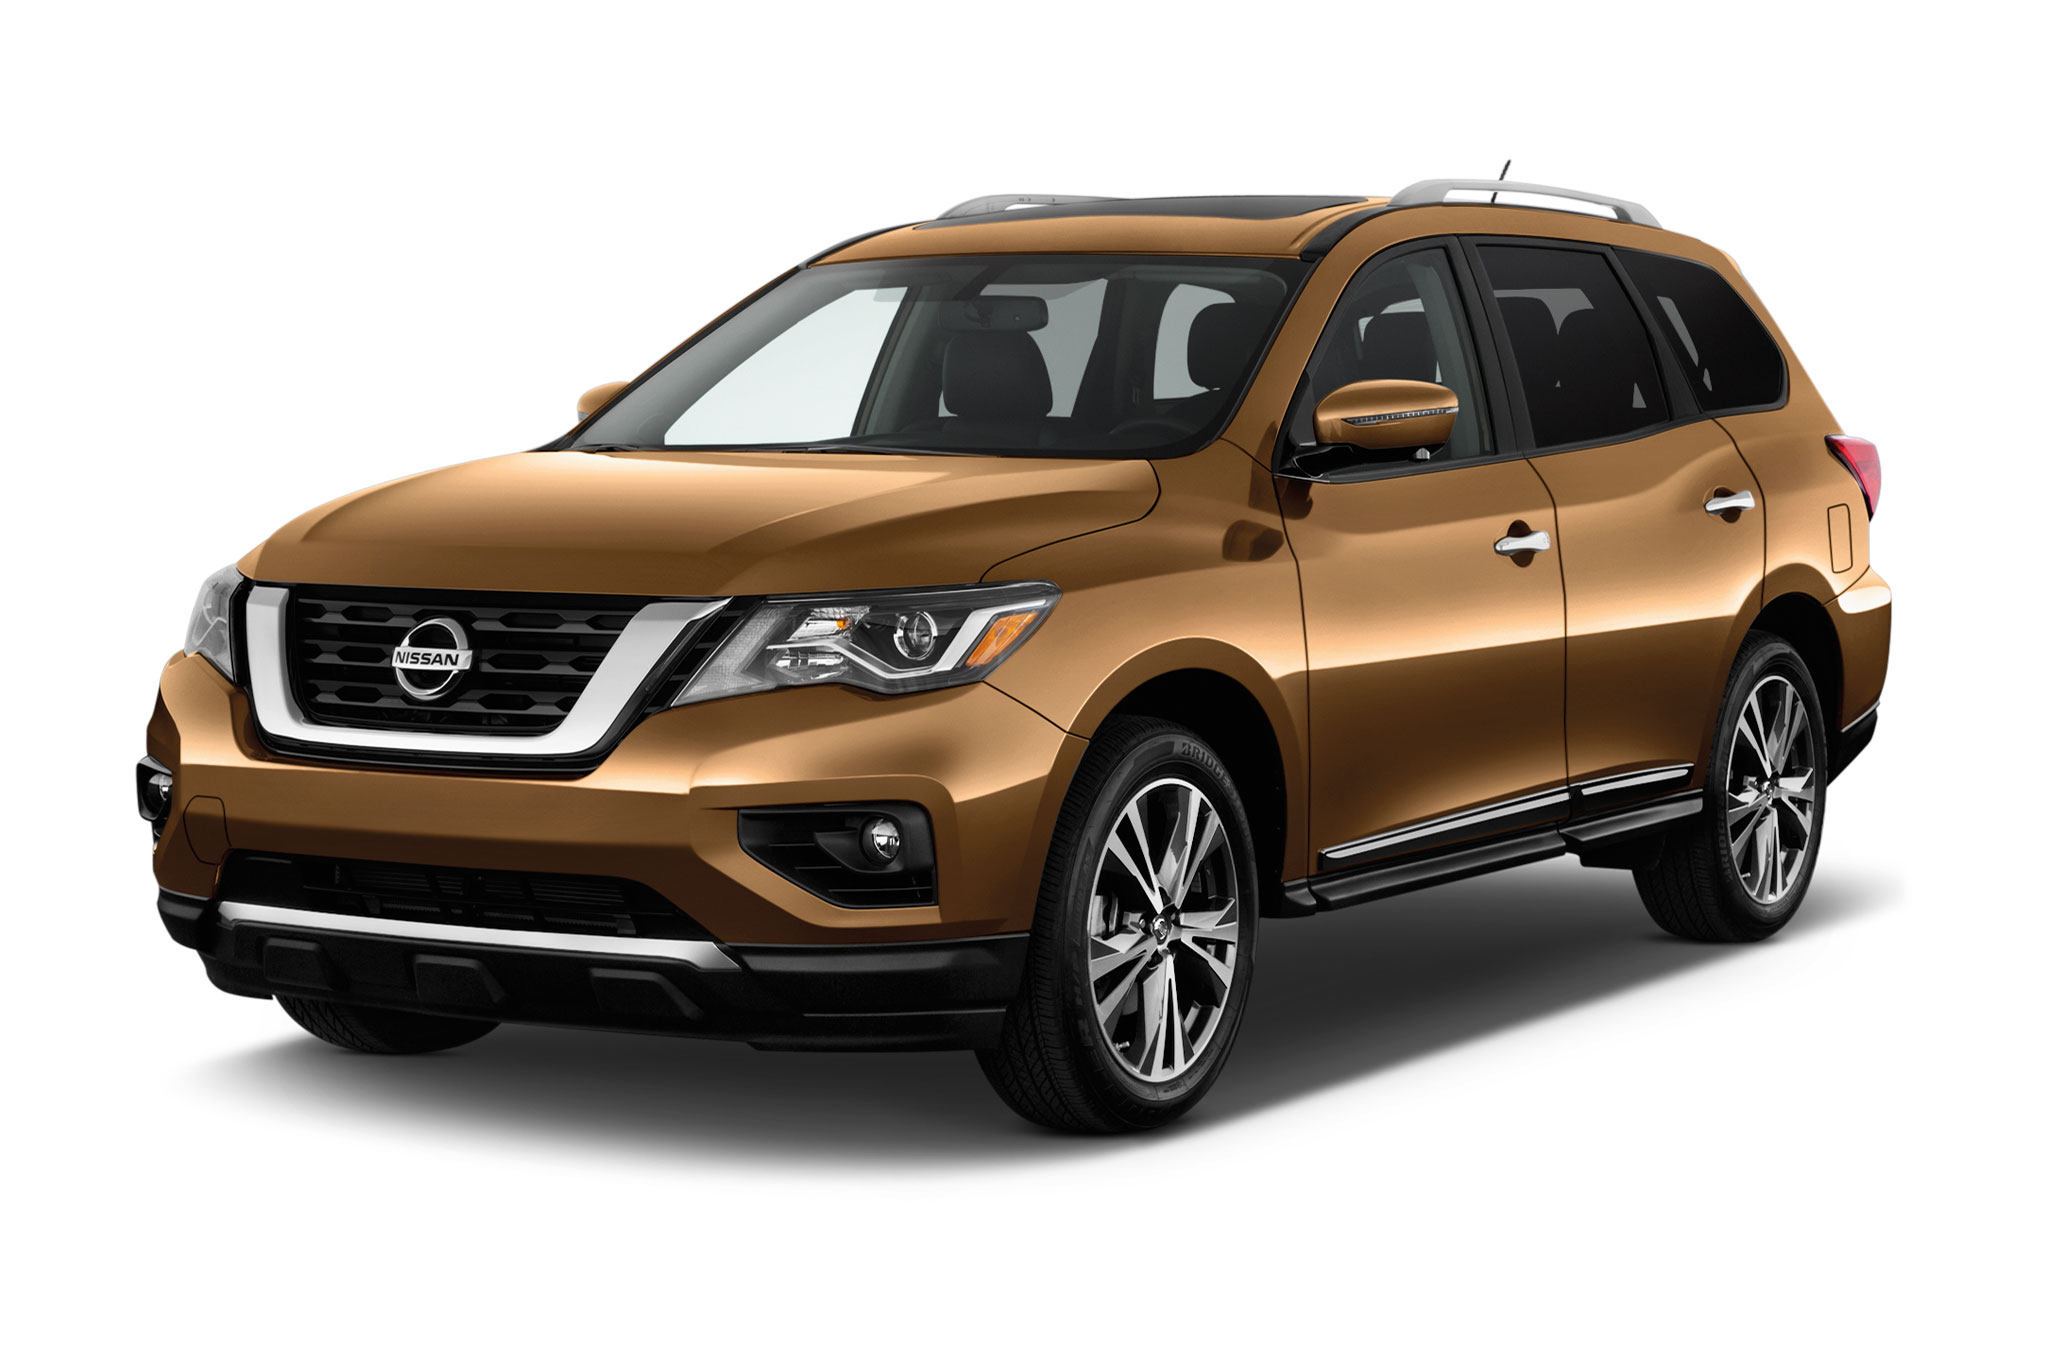 National Standard SUV Nissan Pathfinder